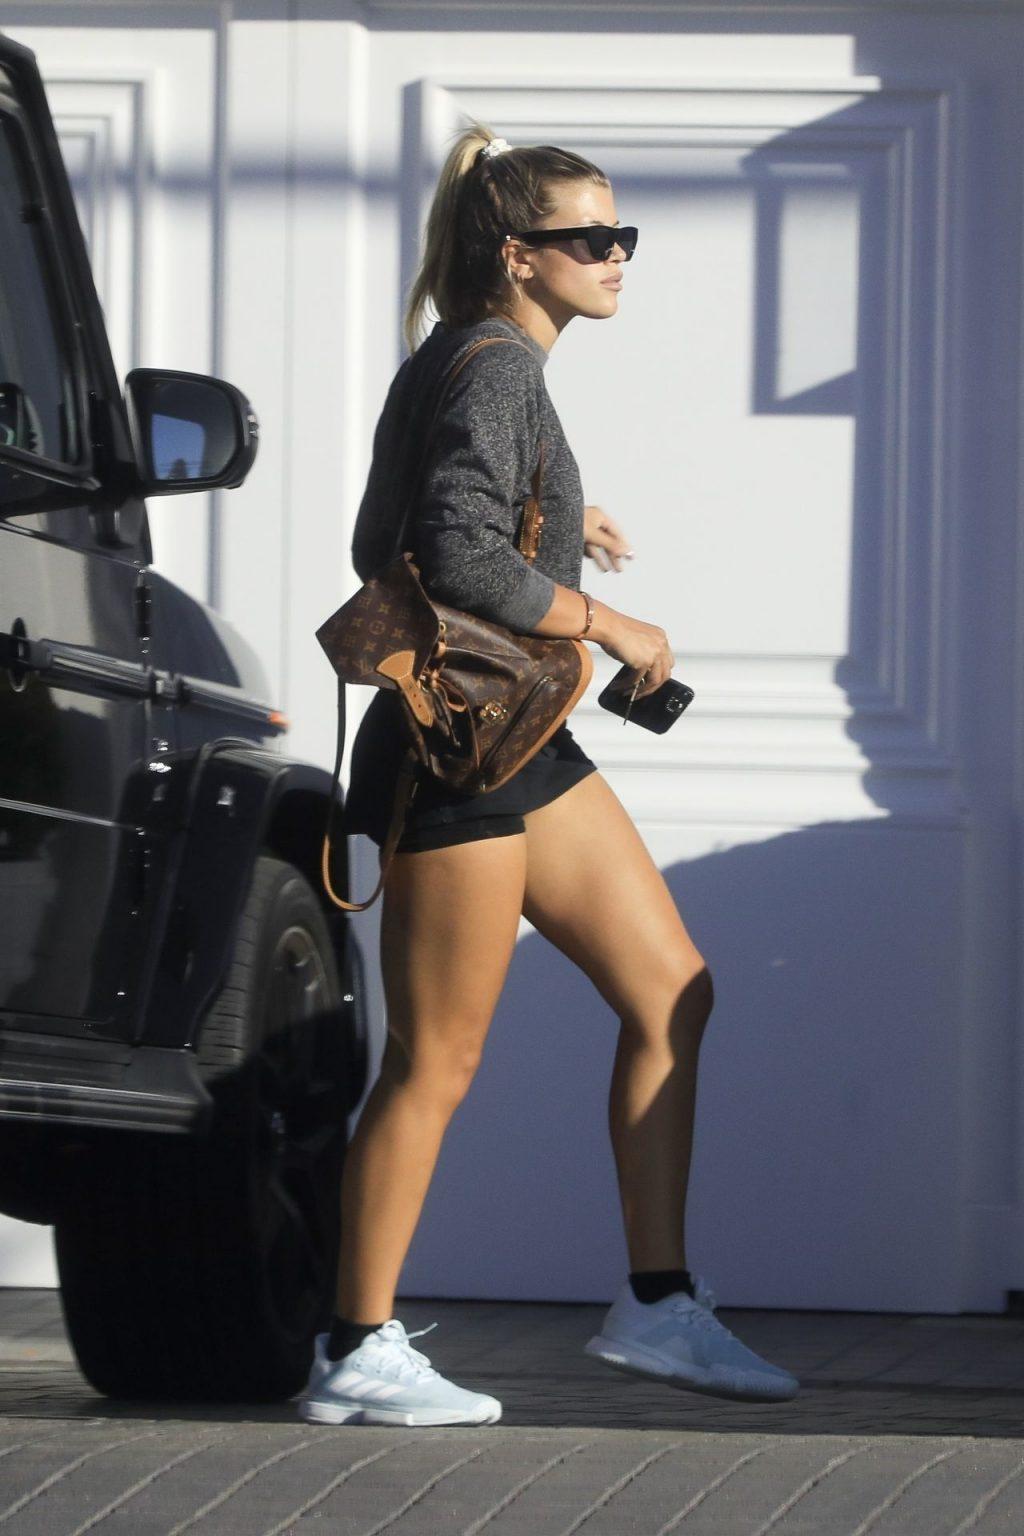 Leggy Sofia Richie Arrives at a Friend's House After a Tennis Session (34 Photos)